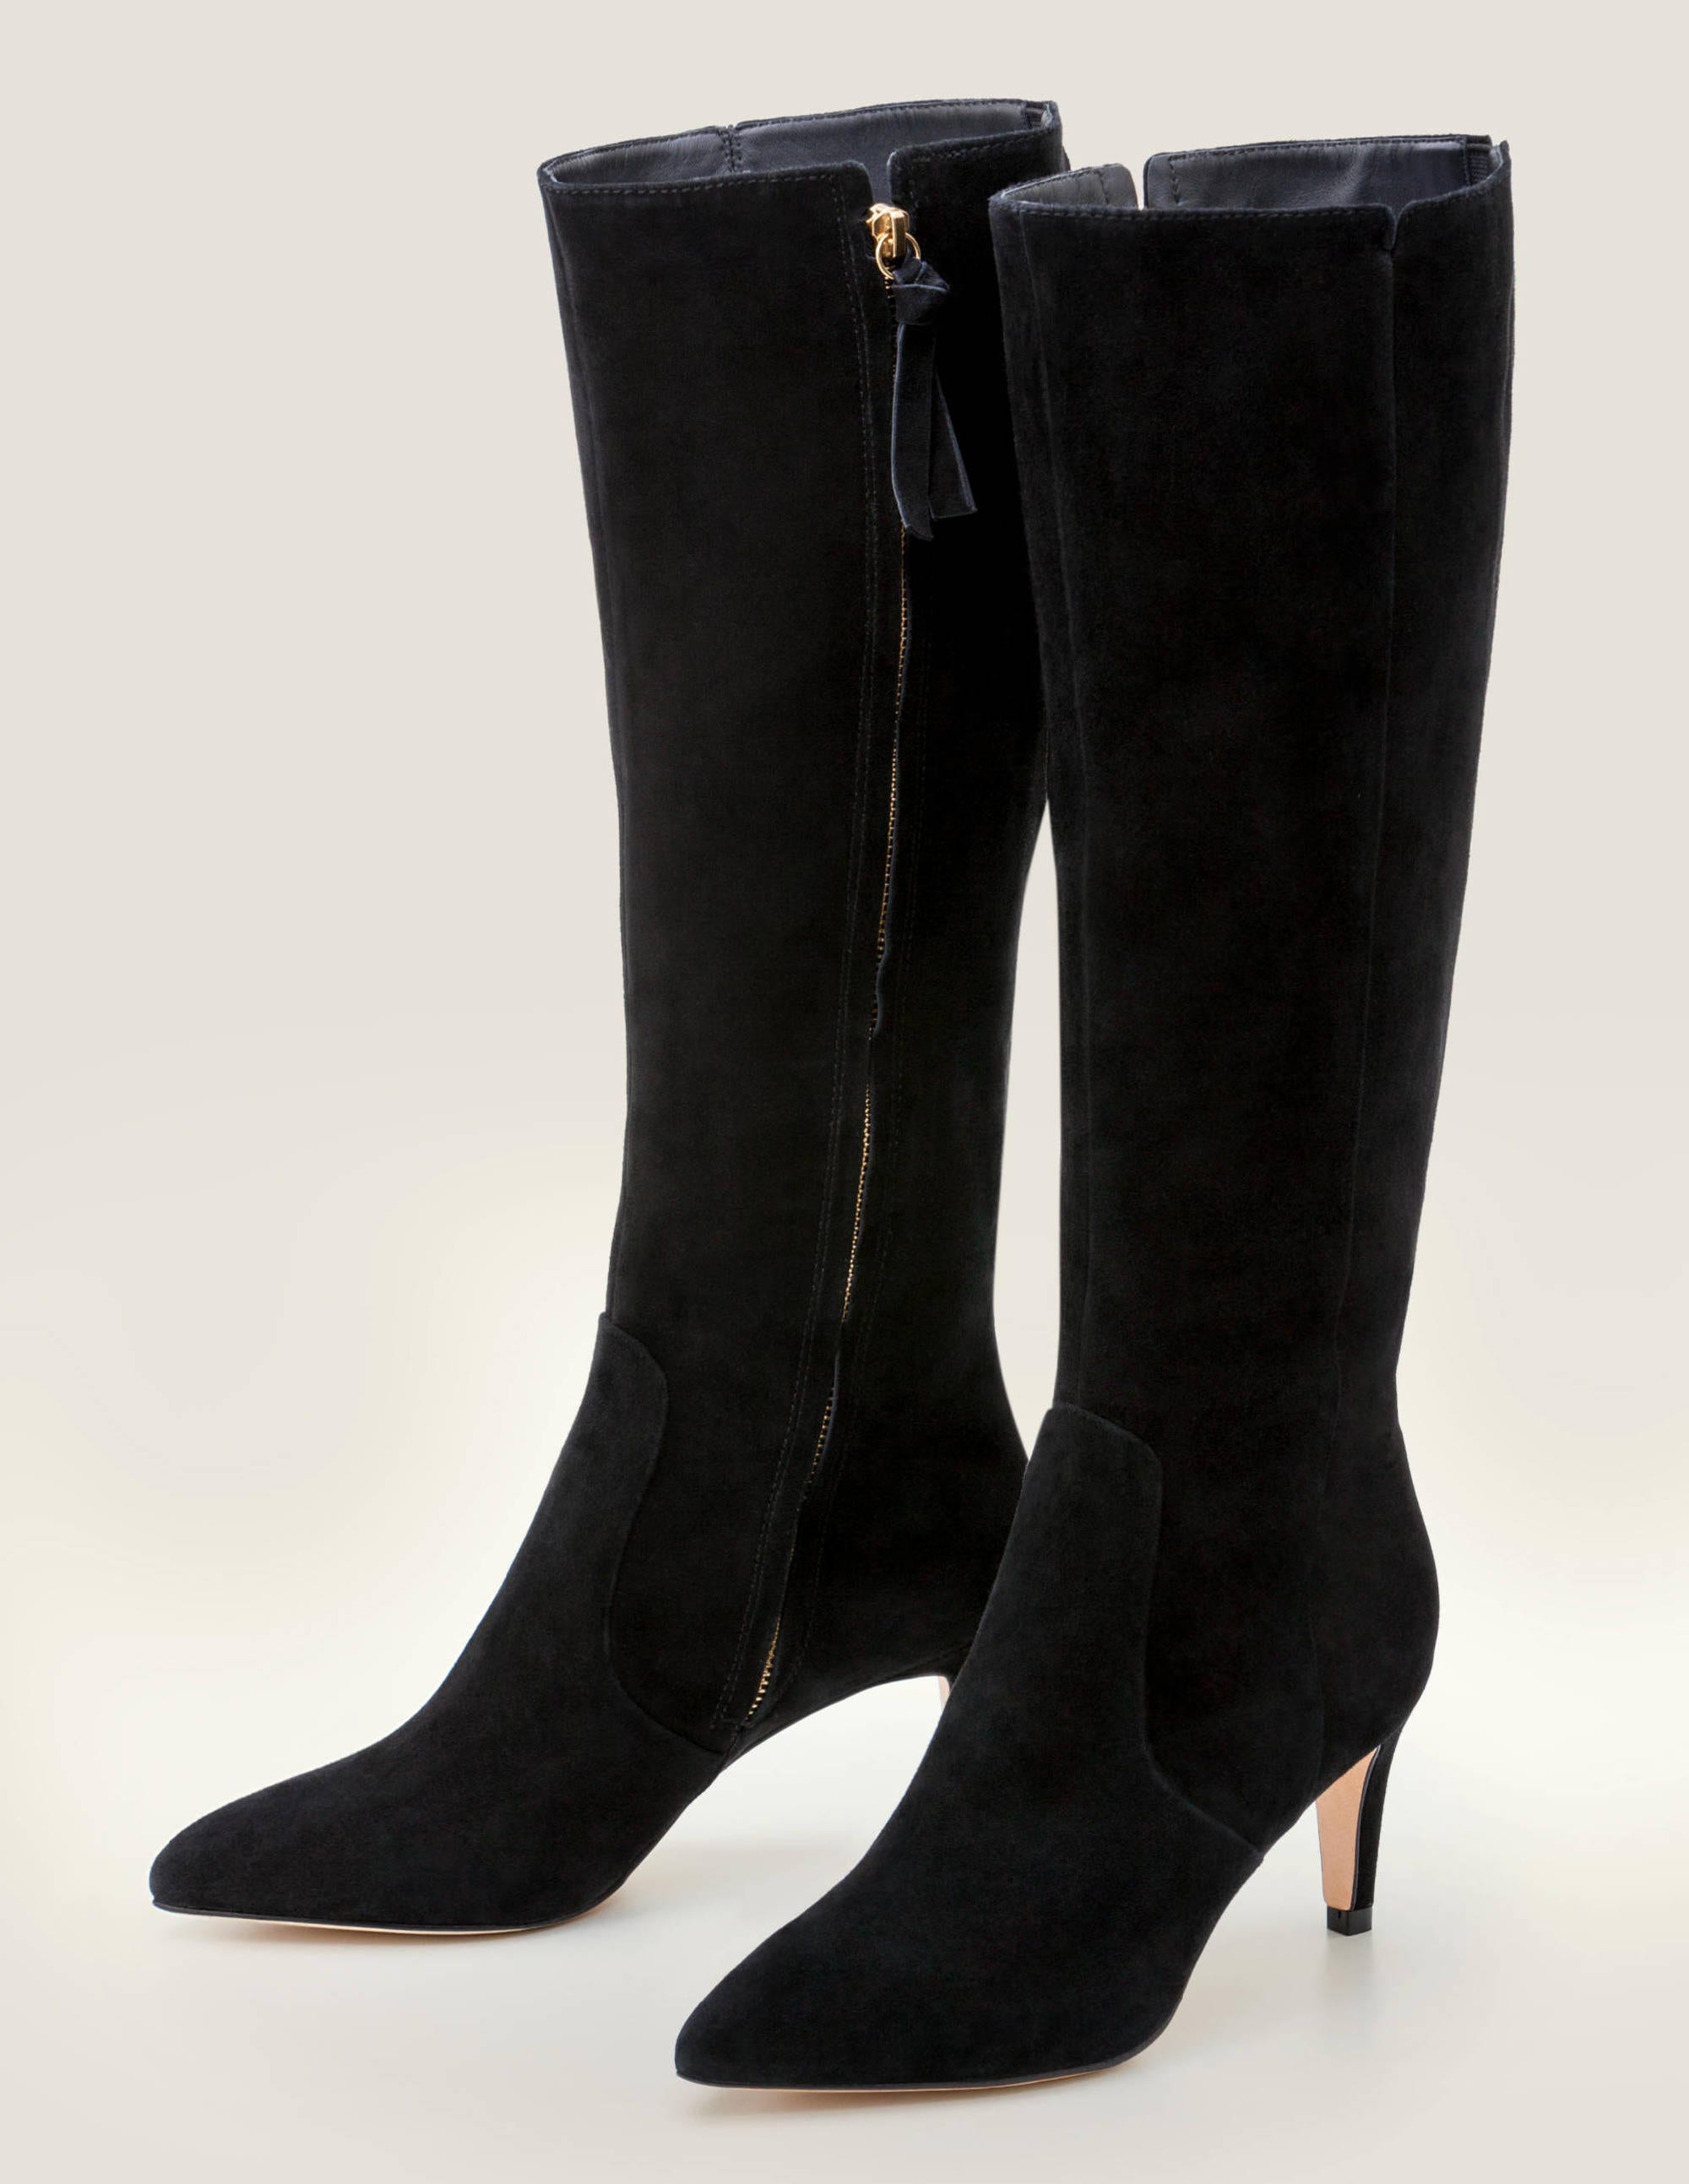 Kenton Knee High Boots Black